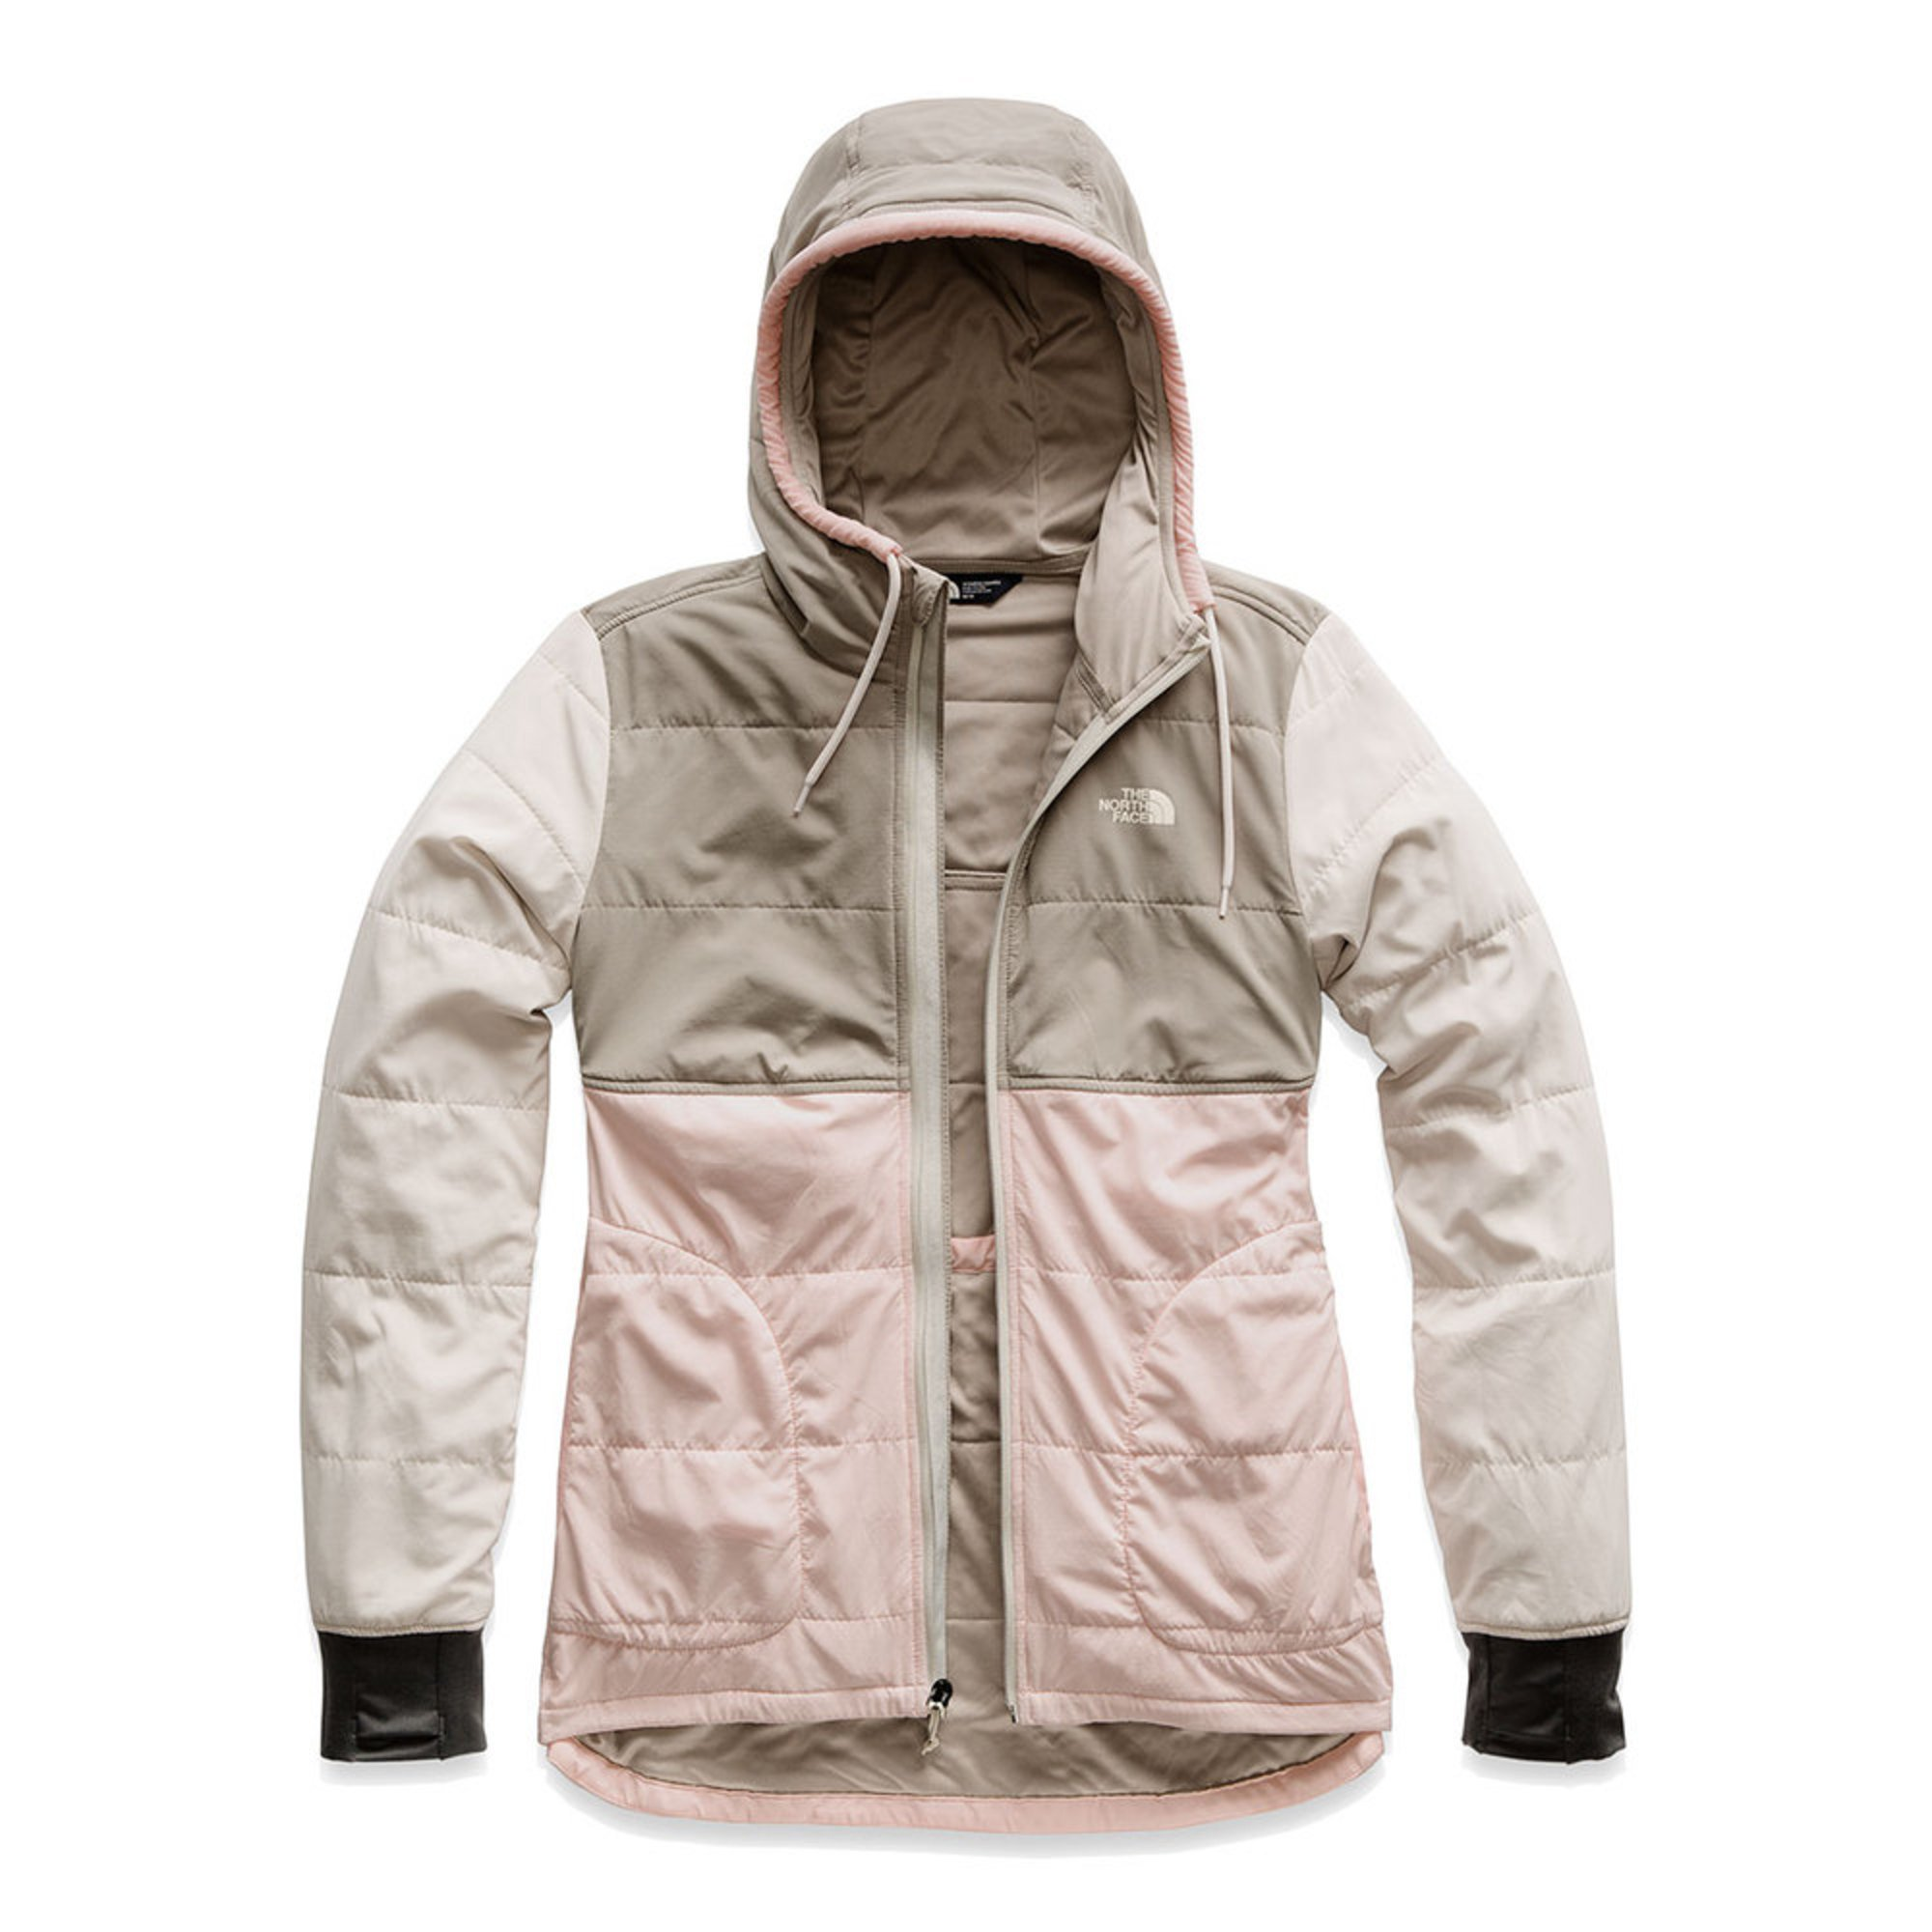 9317634b6 The North Face Women's Mountain Sweatshirt Full Zip